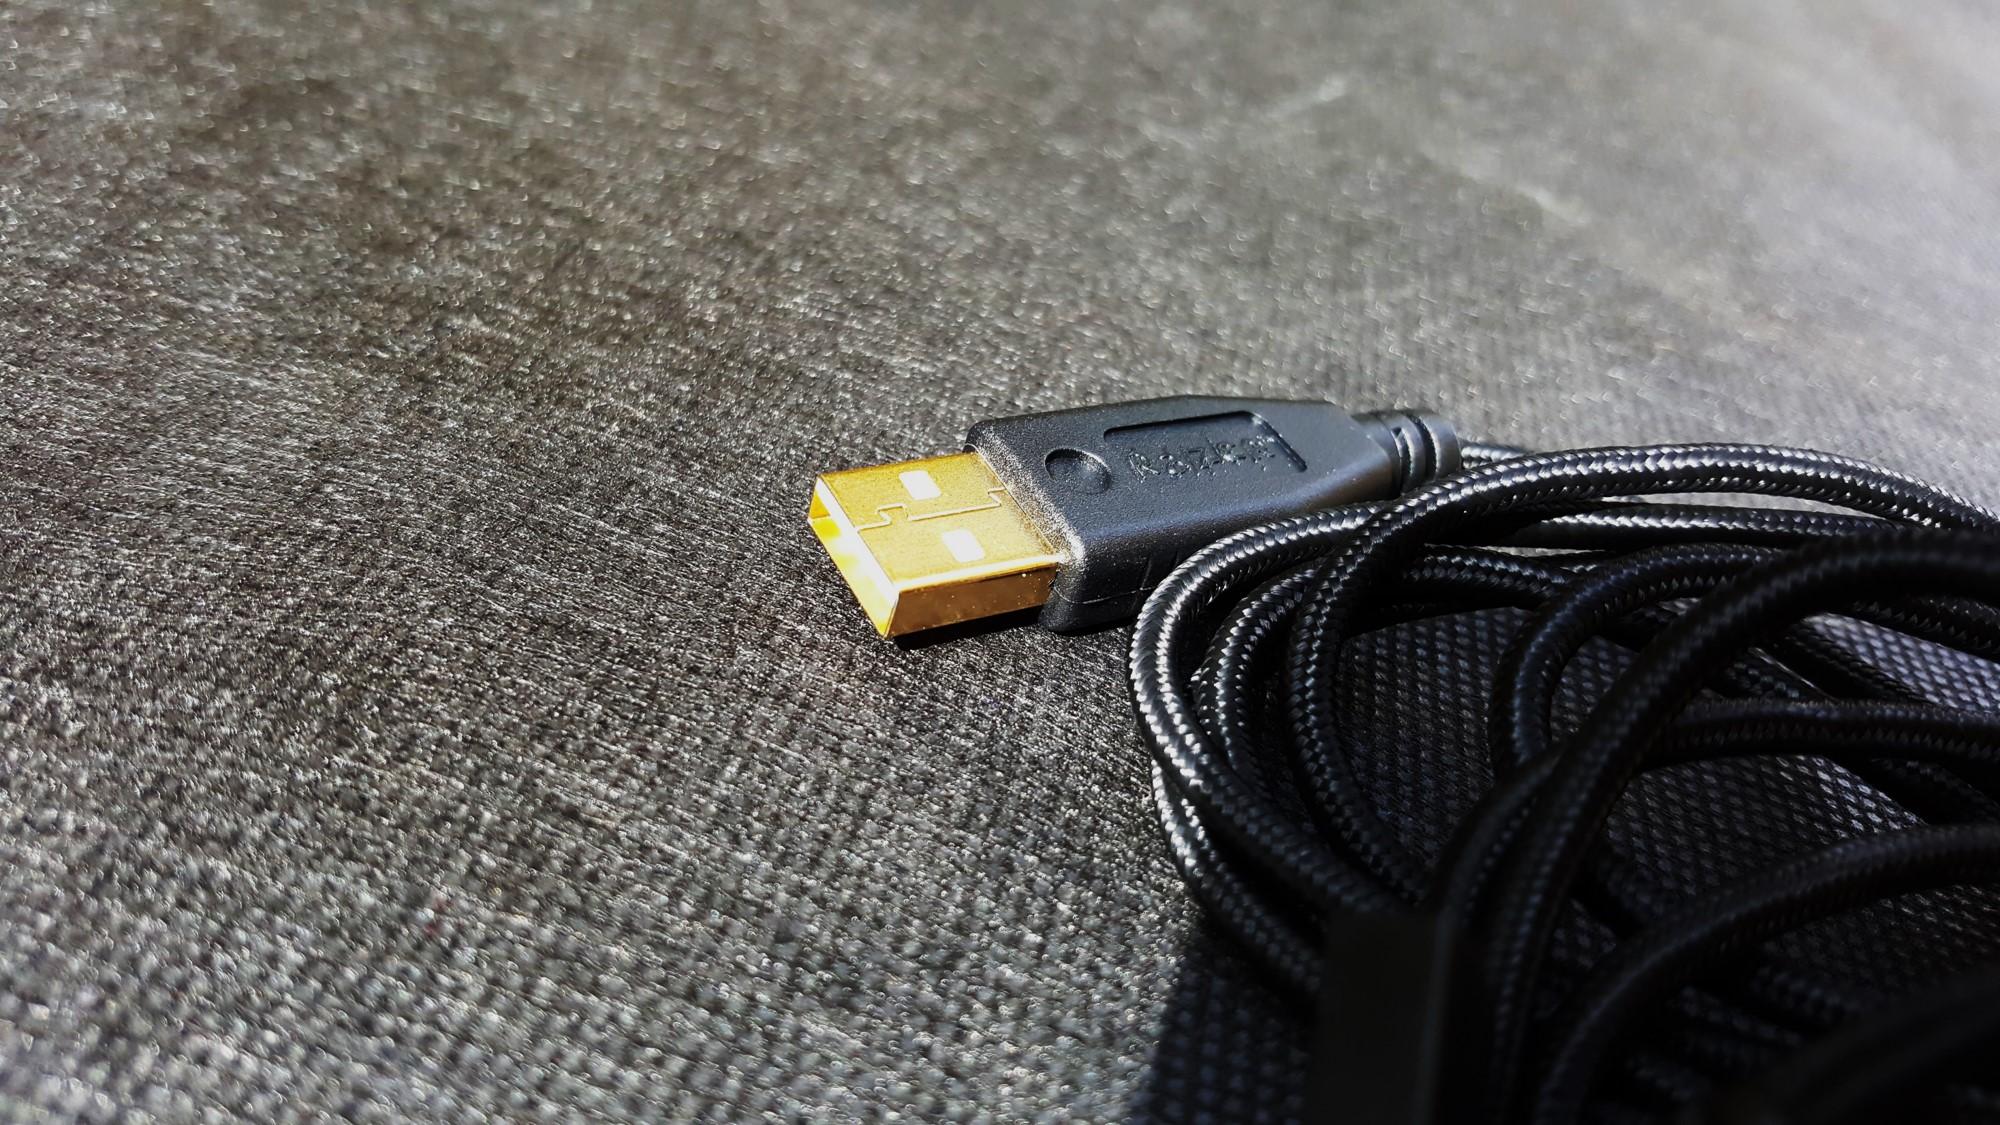 19-Razer Mamba Chroma USB Cable